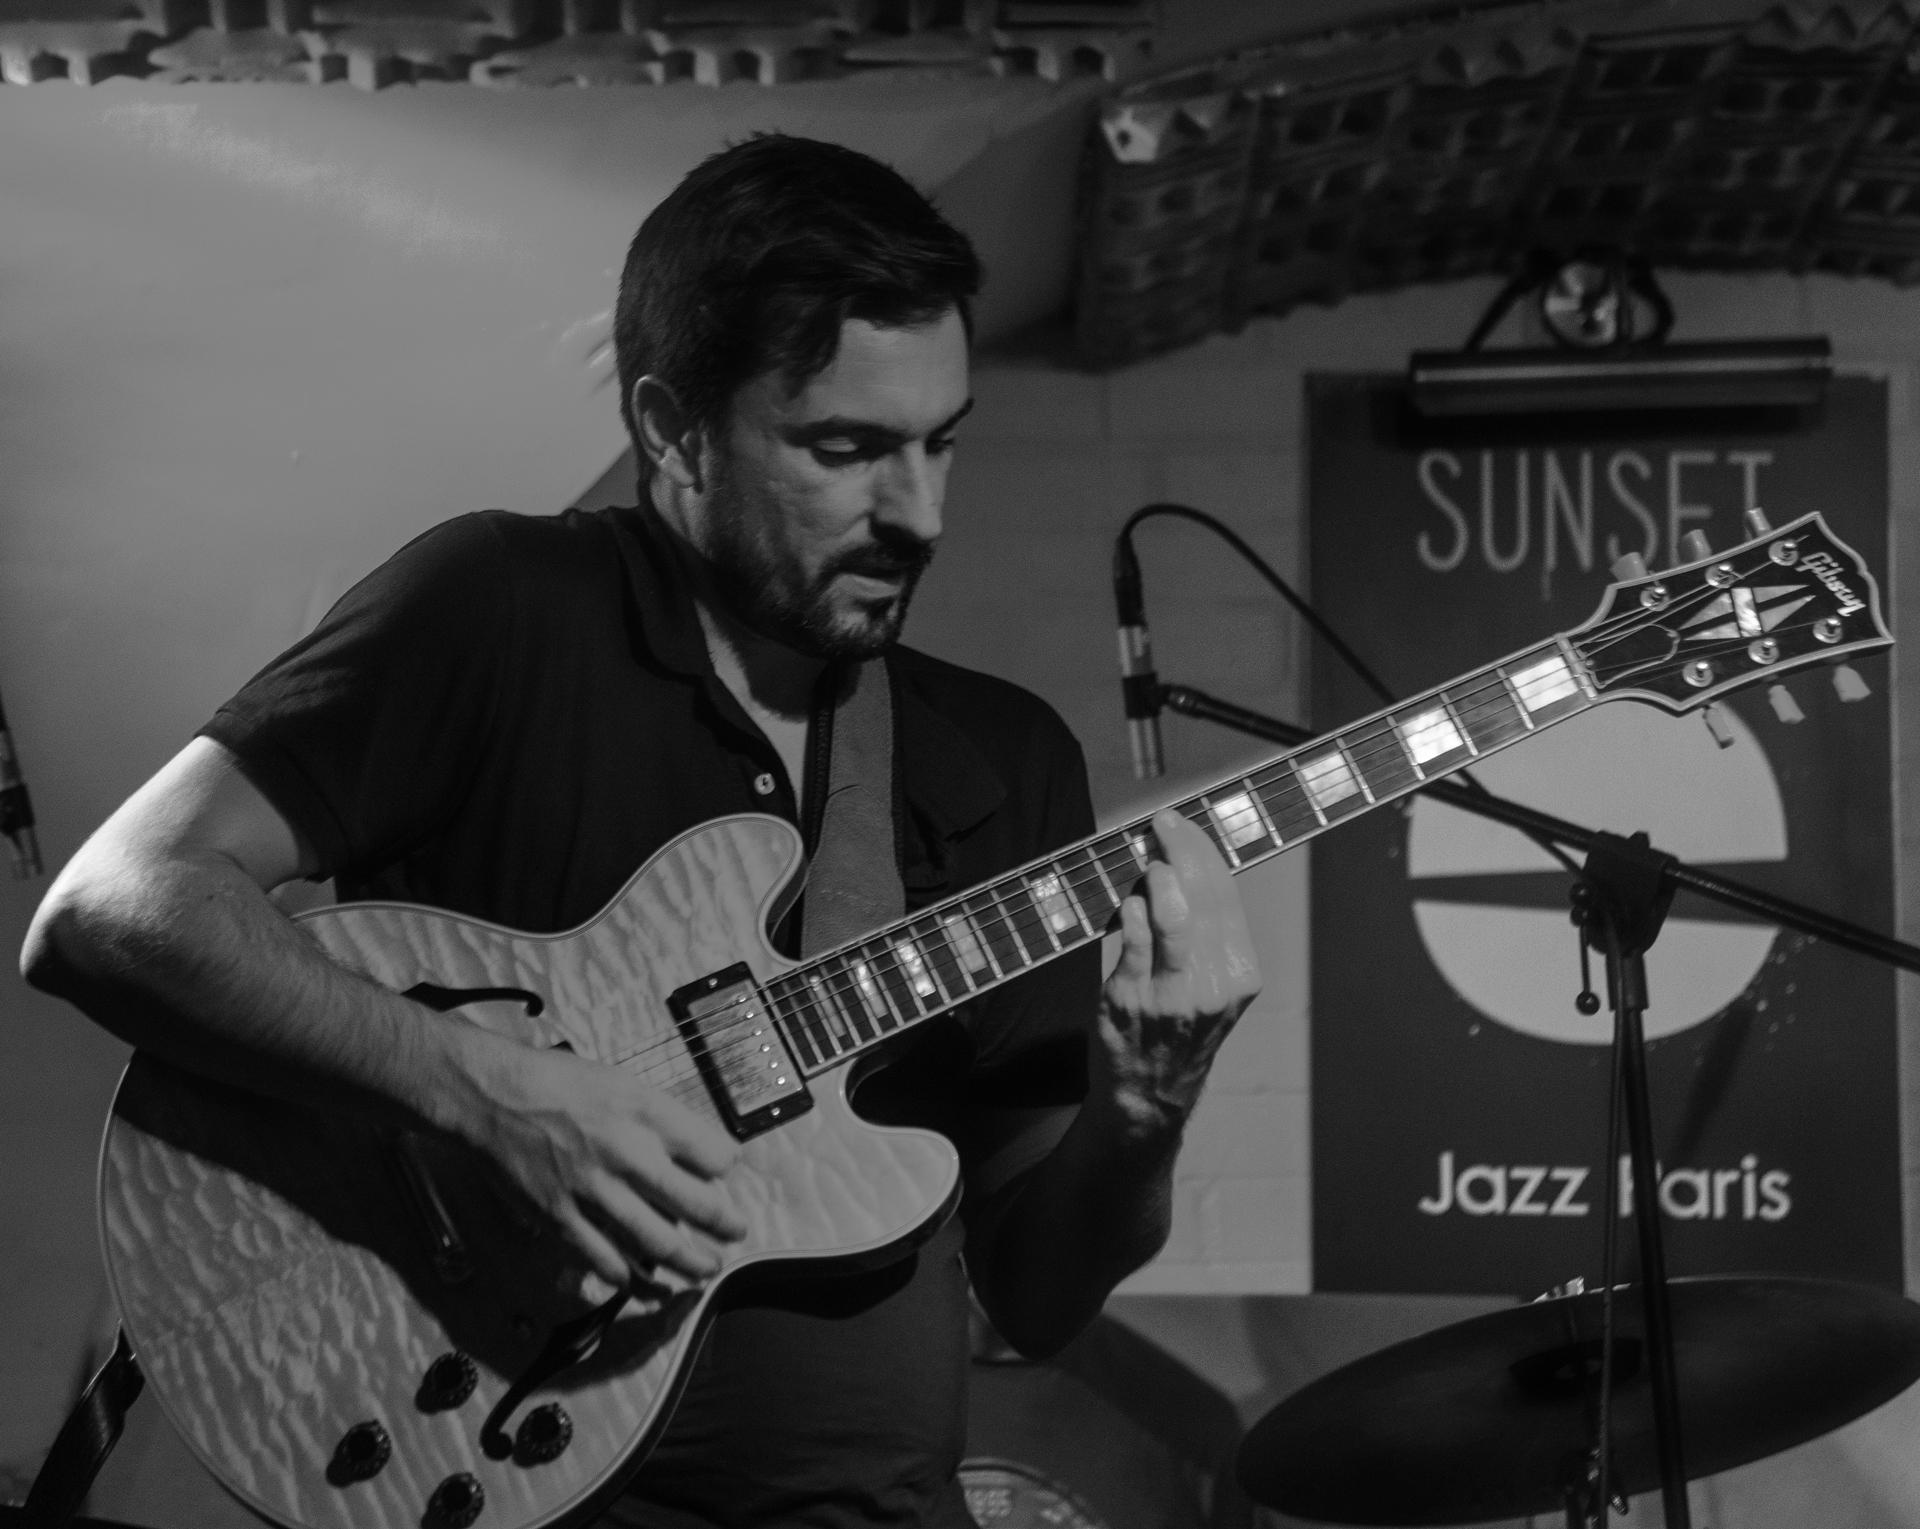 Jazz Rock Progressif - 4dB - Damien Boureau, guitariste fusion - concert Sunset